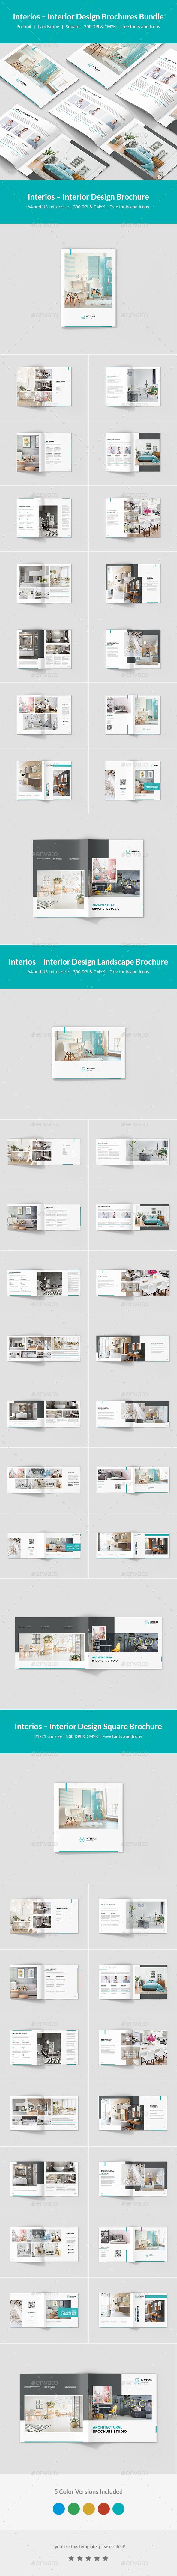 Interios – Interior Design Brochures Bundle Print Templates 3 in 1 - Corporate Brochures